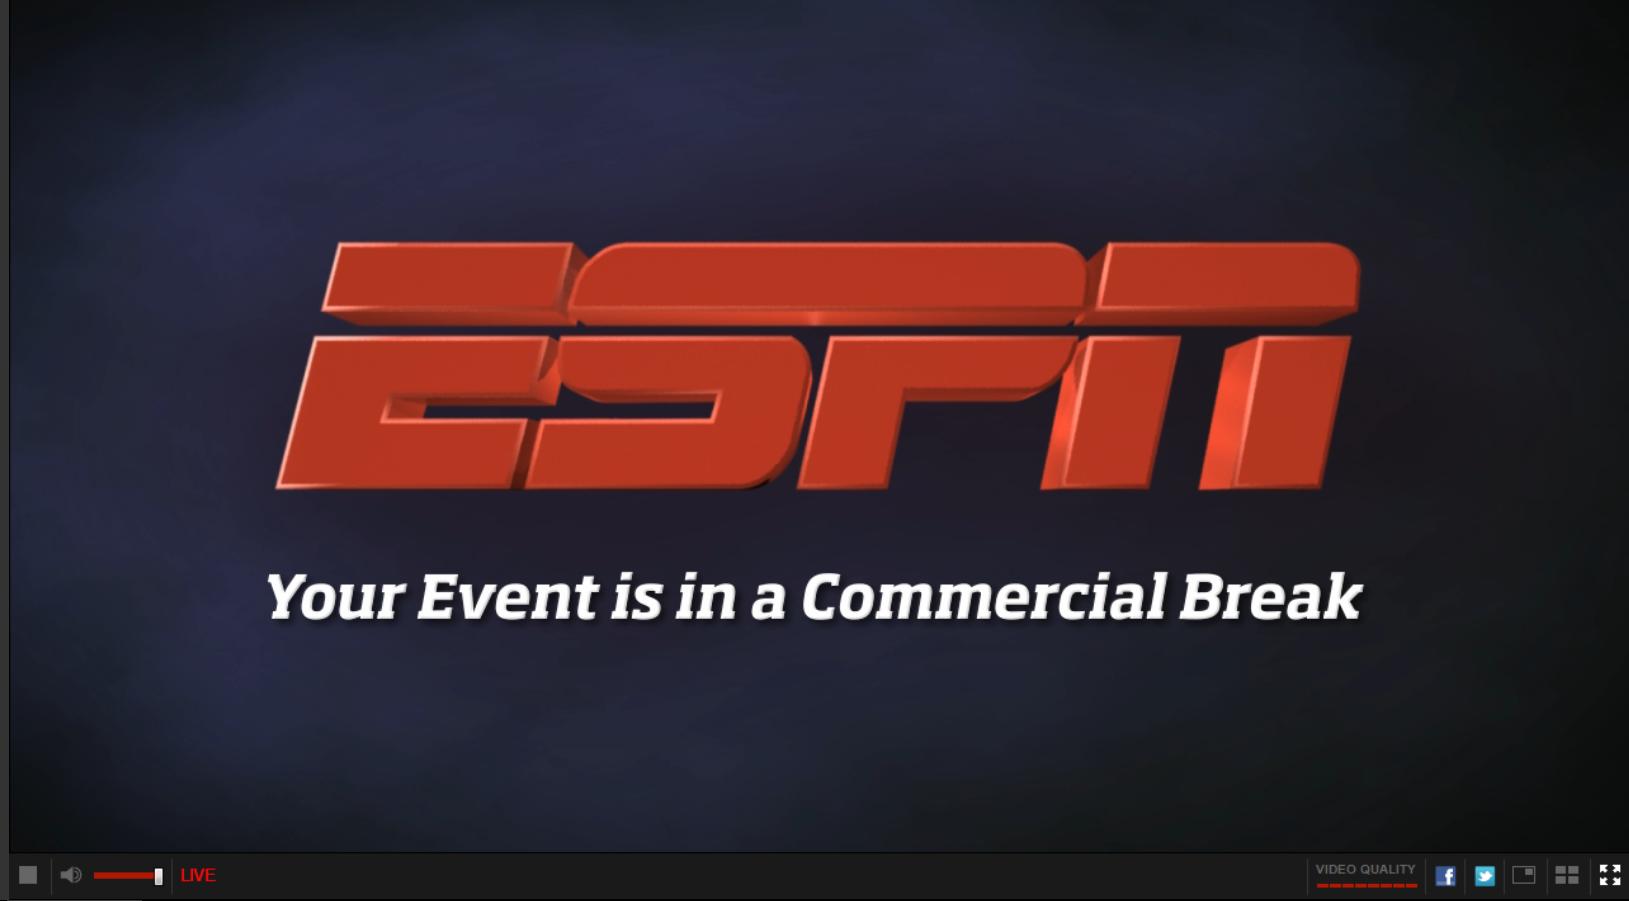 ESPN commercial break digital